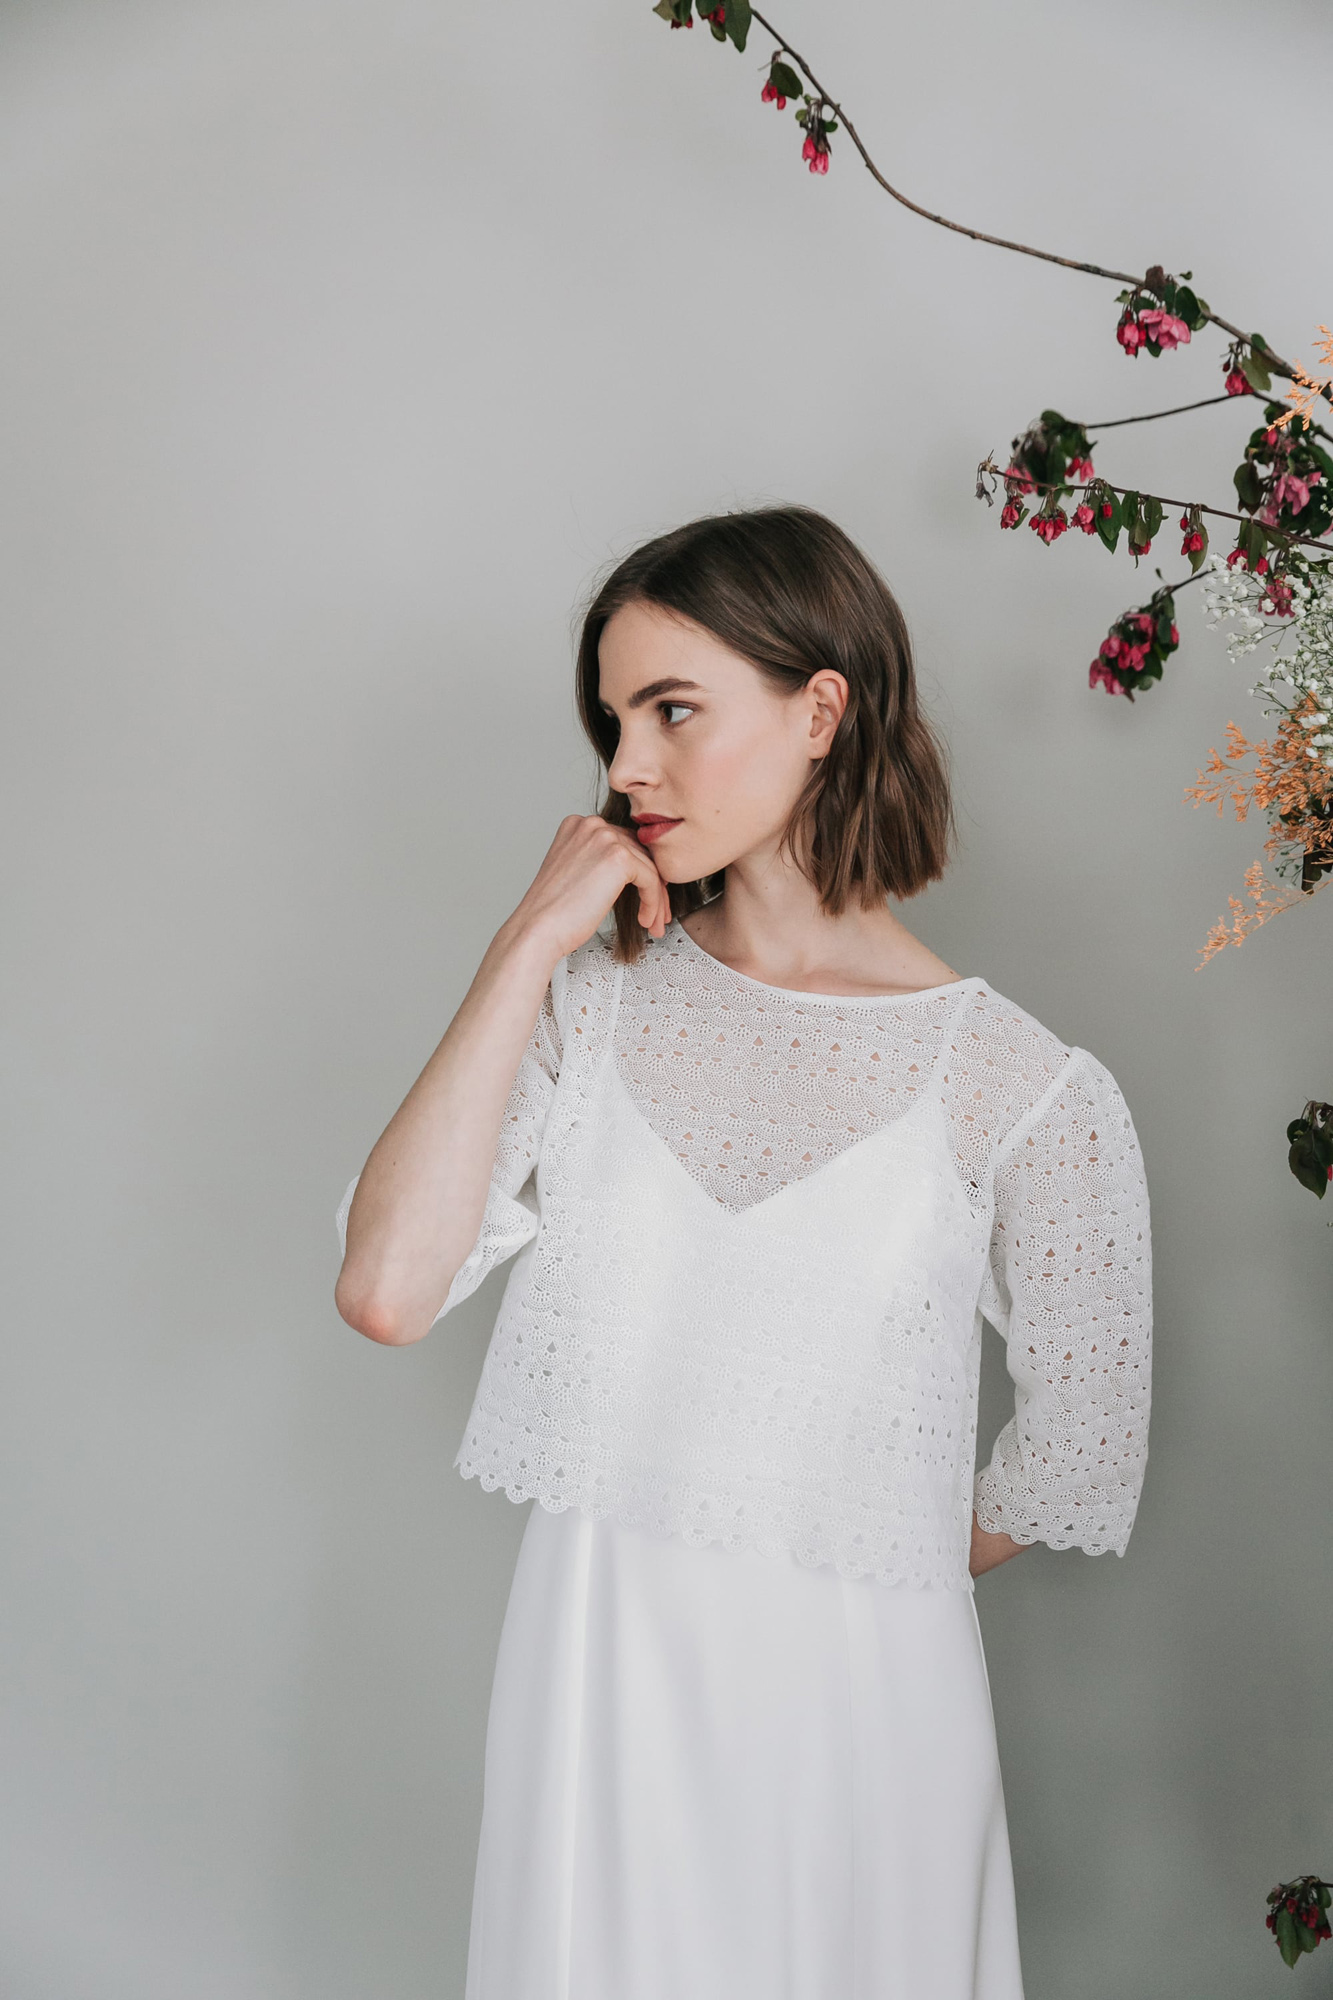 Kate-Beaumont-Sheffield-Freesia-Guipure-Lace-Jacket-Snowdrop-Minimal-Modern-Elegant-Matt-Silk-Wedding-Gown-1.jpg